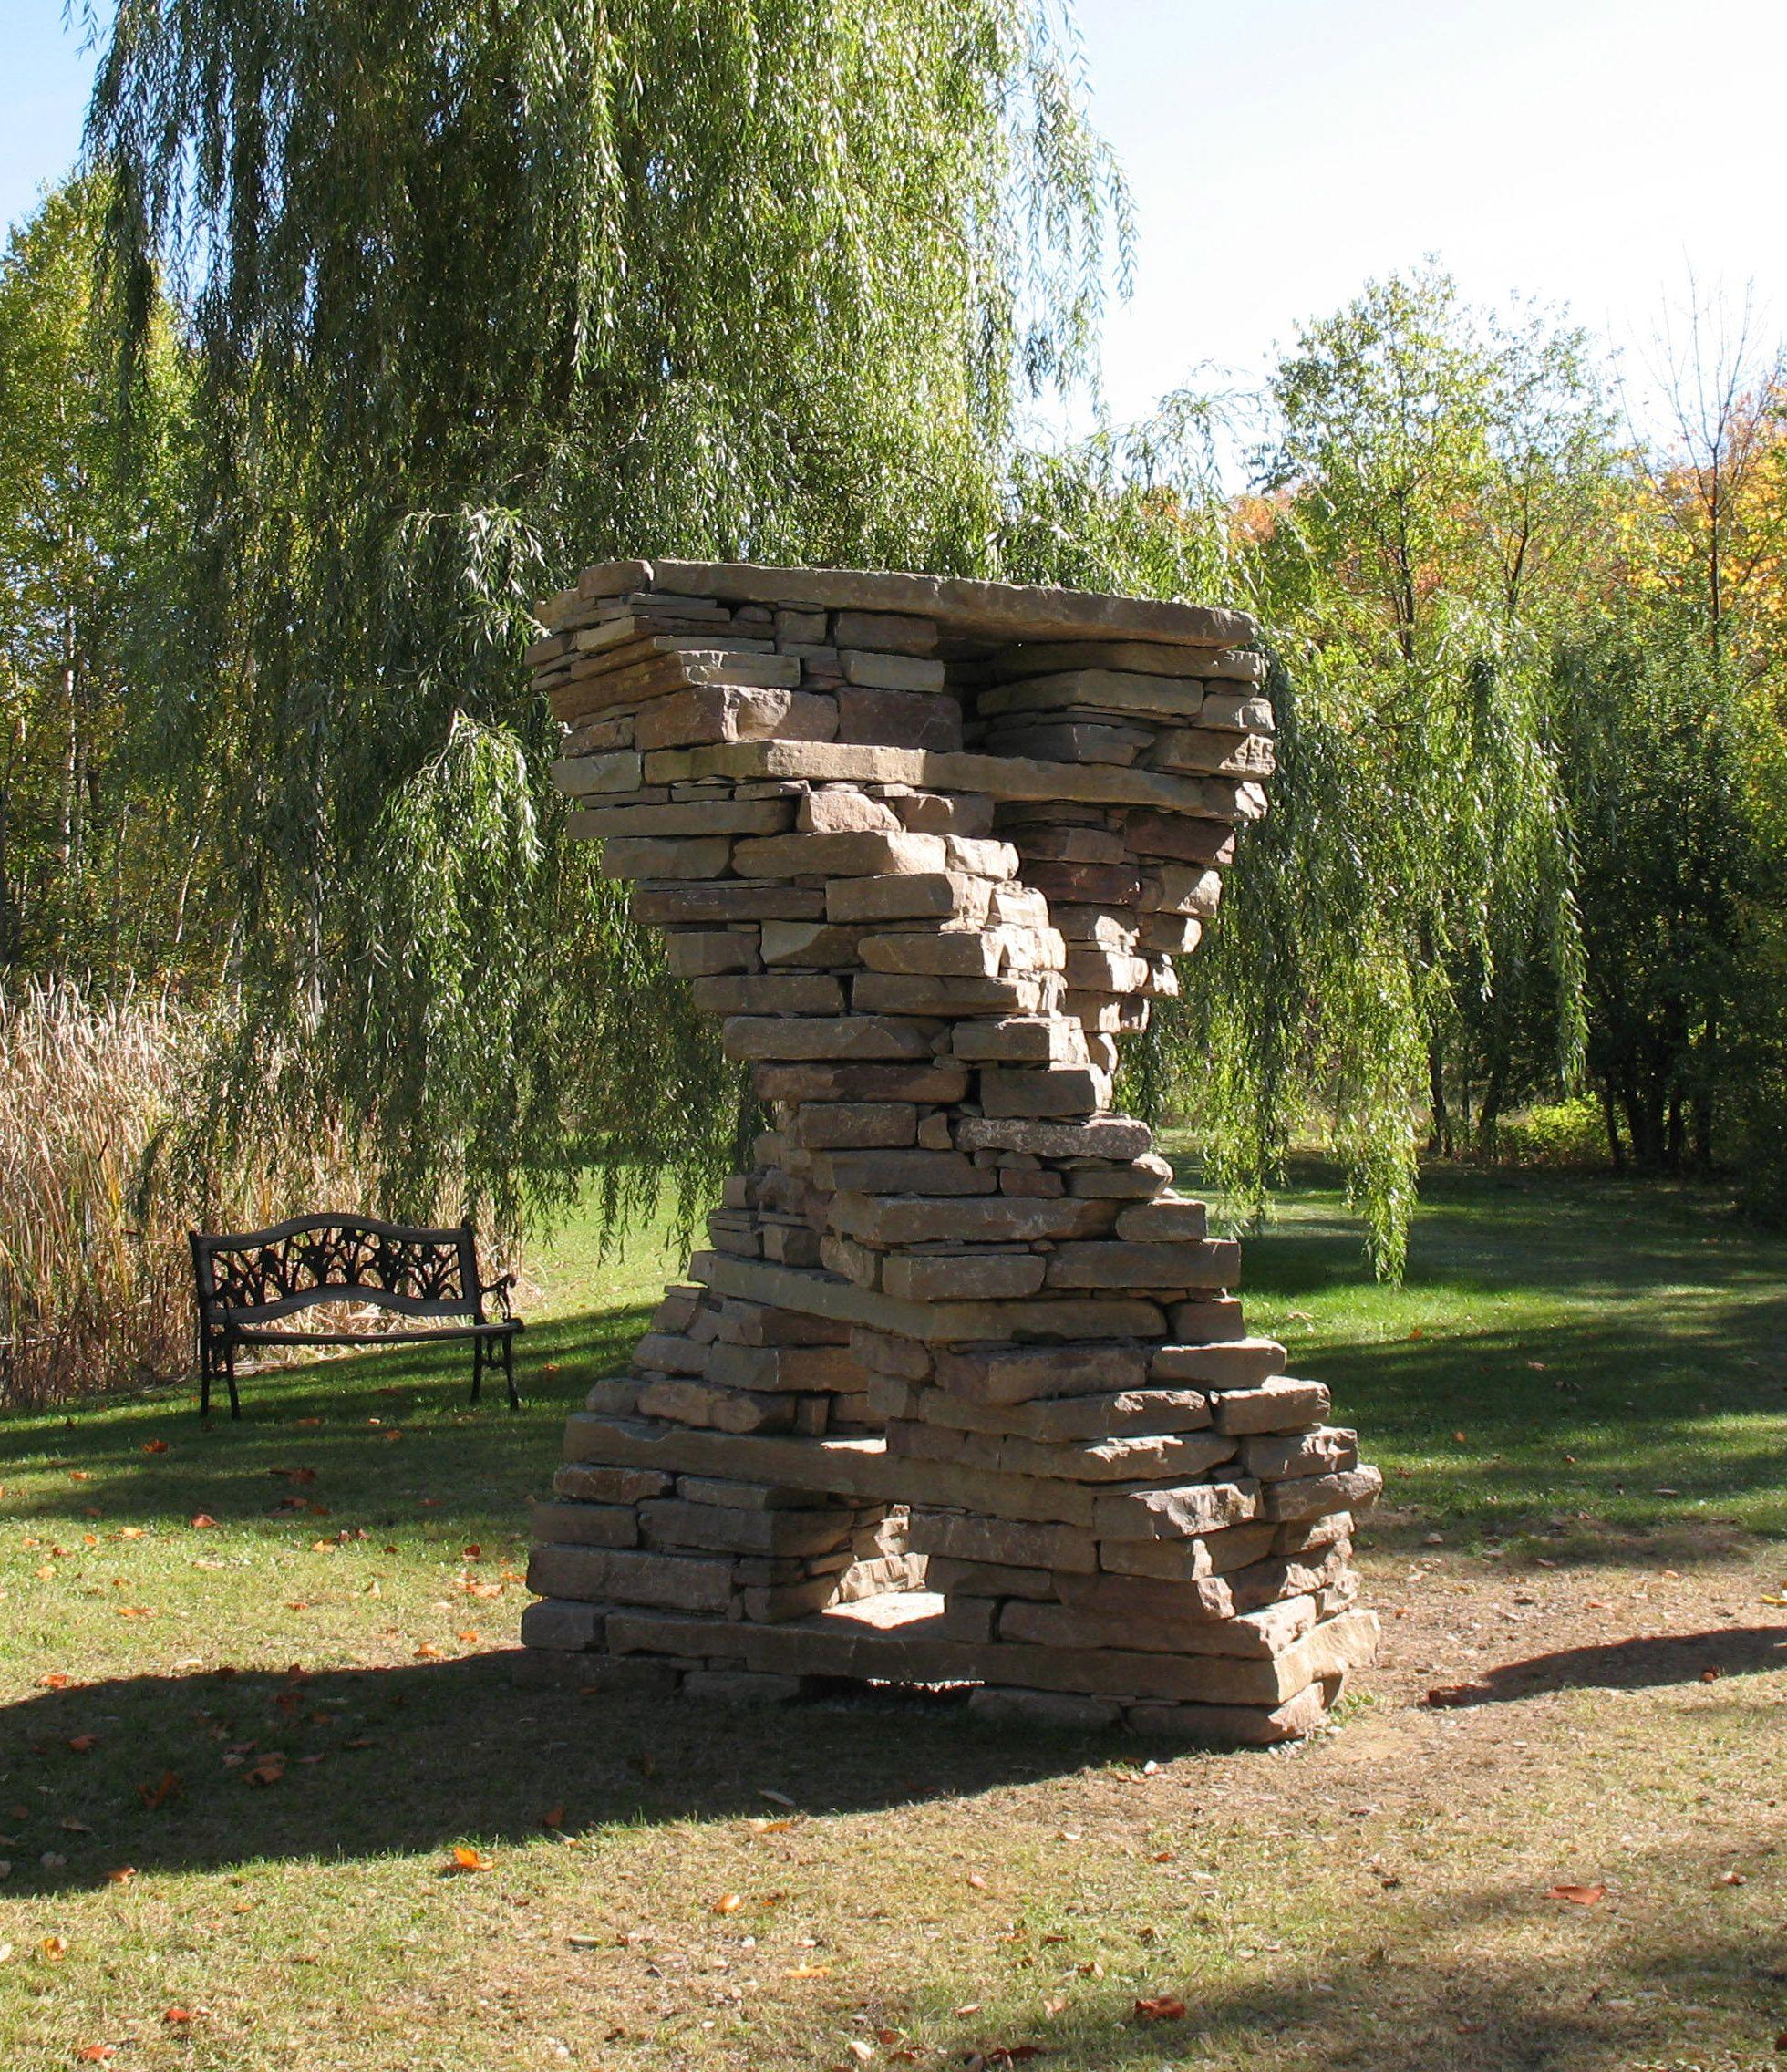 Dswac Dry Stone Wall Association Of Canada  Upper Canada